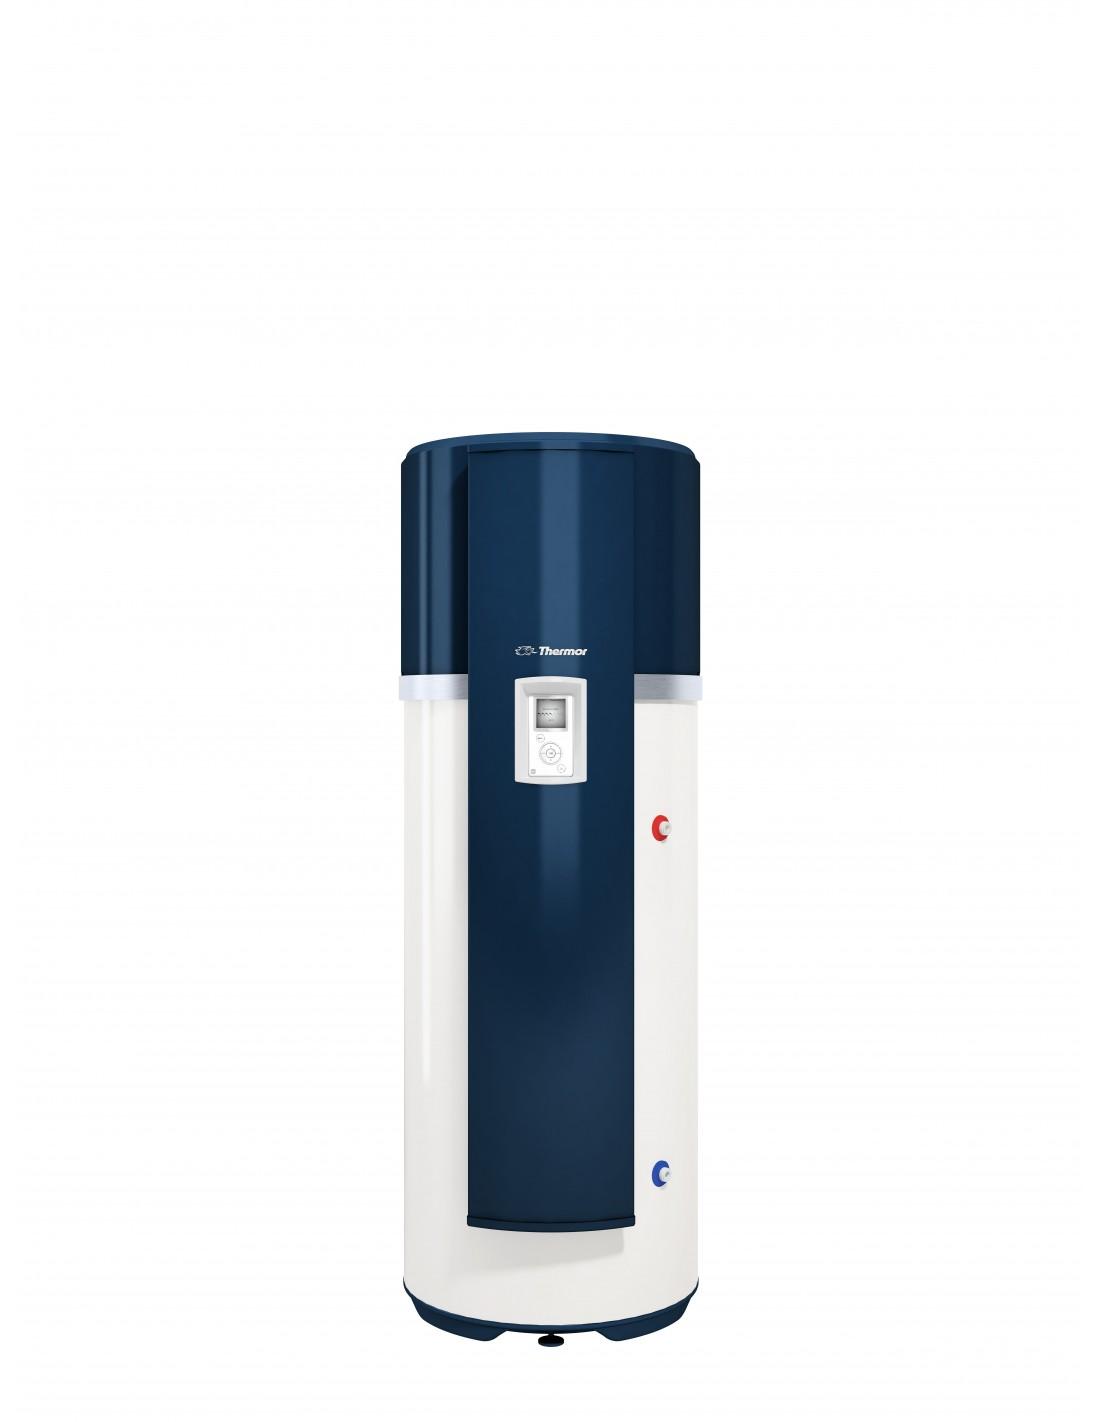 chauffe eau thermodynamique 270l a romax 4 thermor. Black Bedroom Furniture Sets. Home Design Ideas